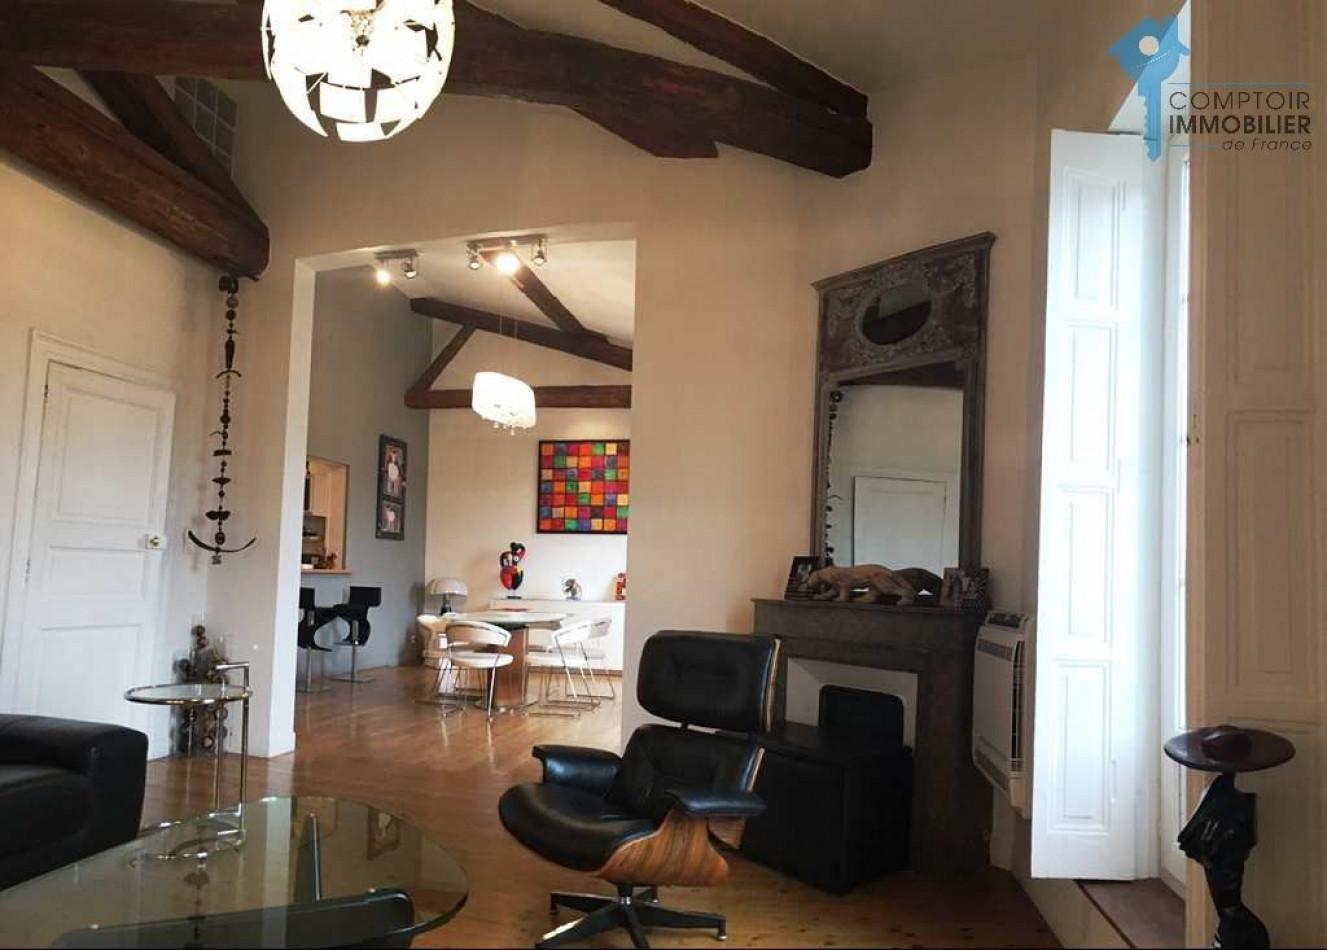 A vendre Montpellier  3438026862 Cif prestige